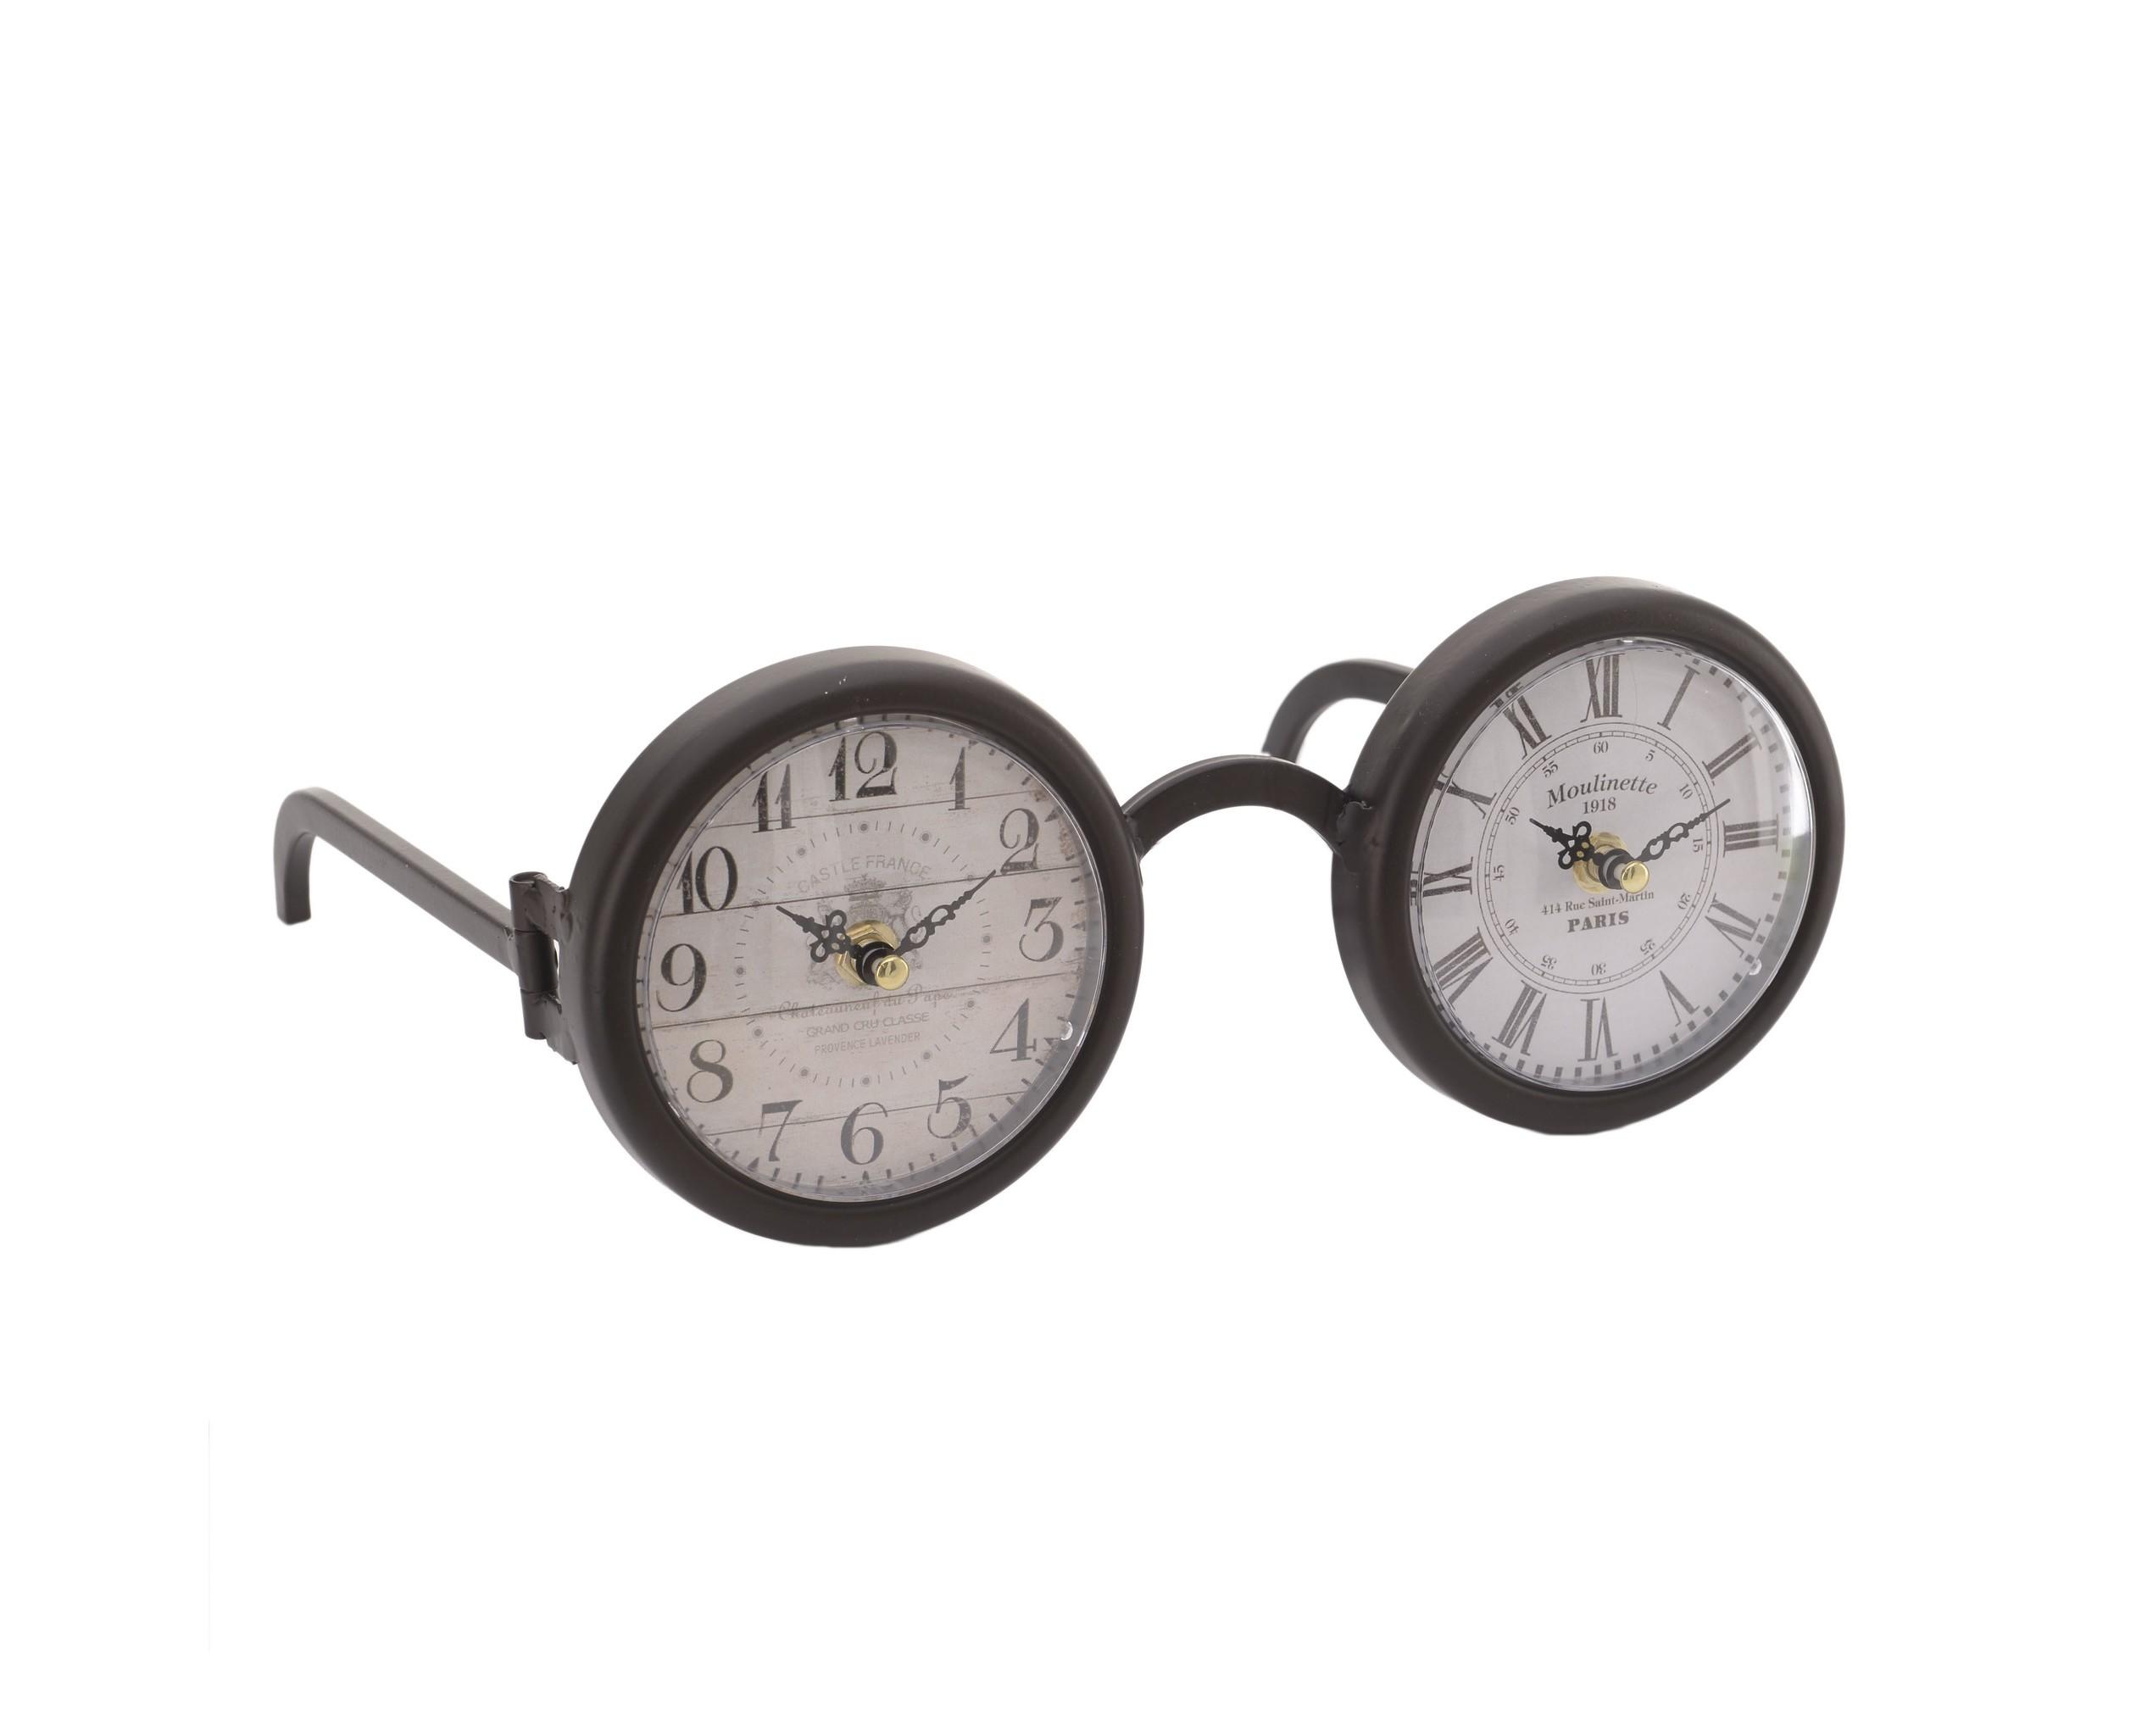 Часы настольные FasslerНастольные часы<br>Кварцевый механизм<br><br>Material: Металл<br>Ширина см: 29.0<br>Высота см: 23.0<br>Глубина см: 12.0